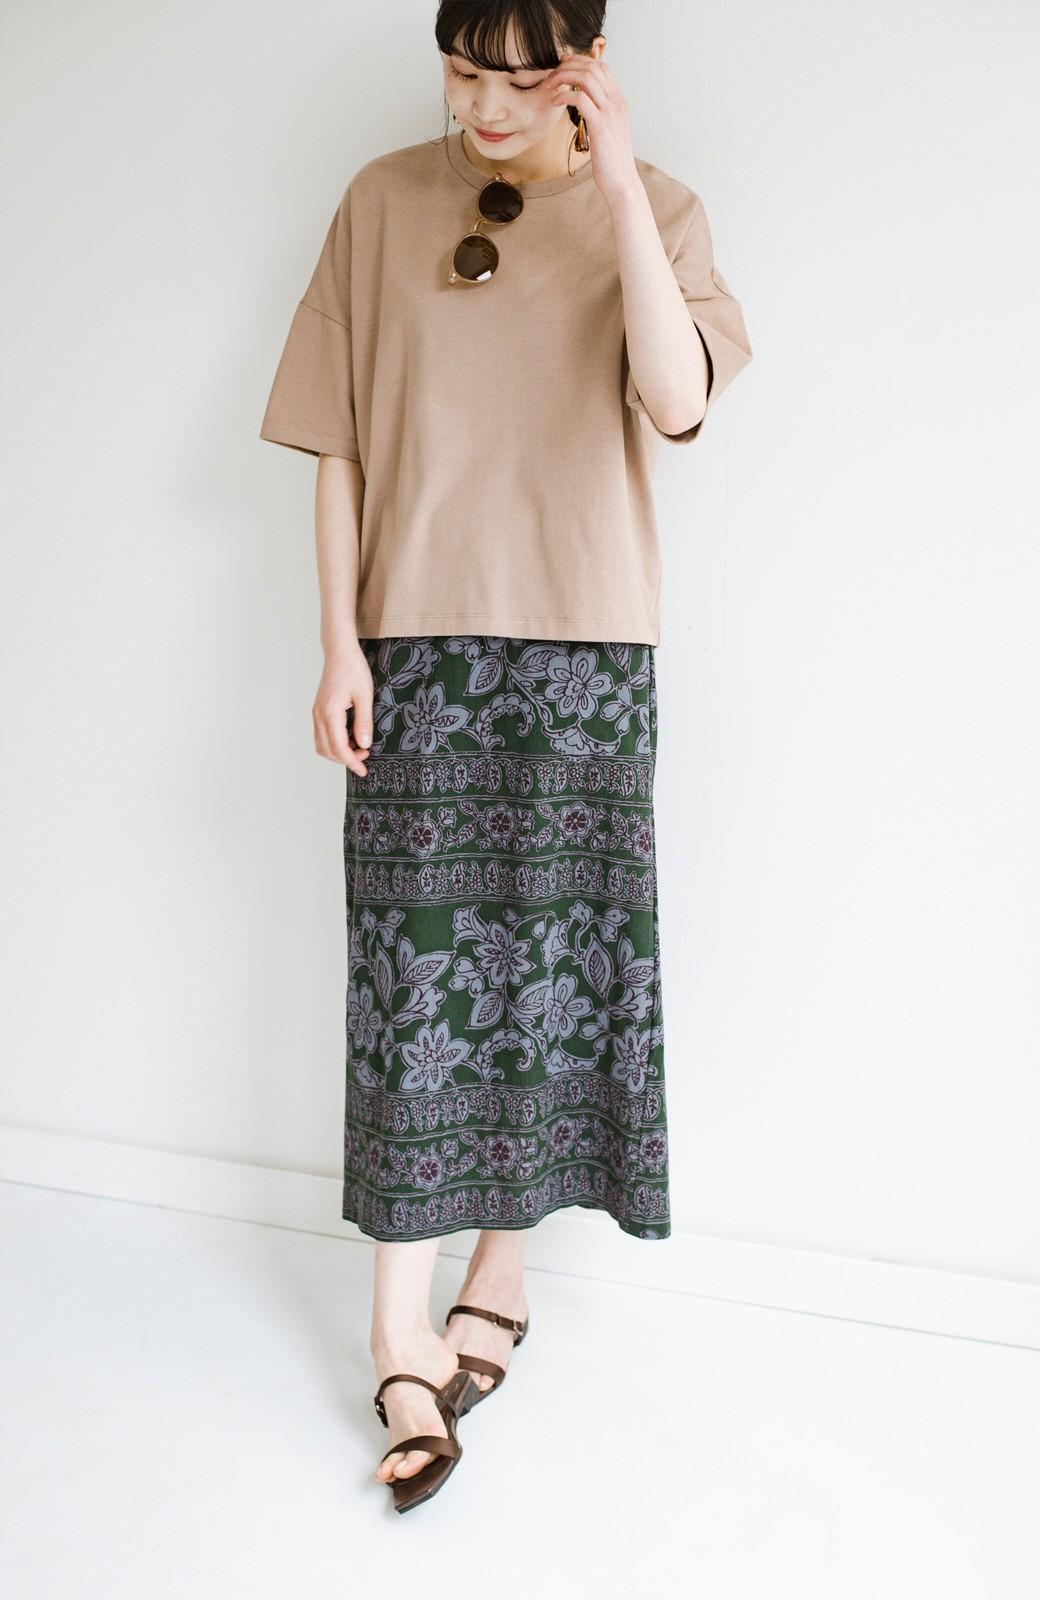 haco! 京都の浴衣屋さんと作った浴衣生地のセミタイトスカート <グリーン系その他>の商品写真19